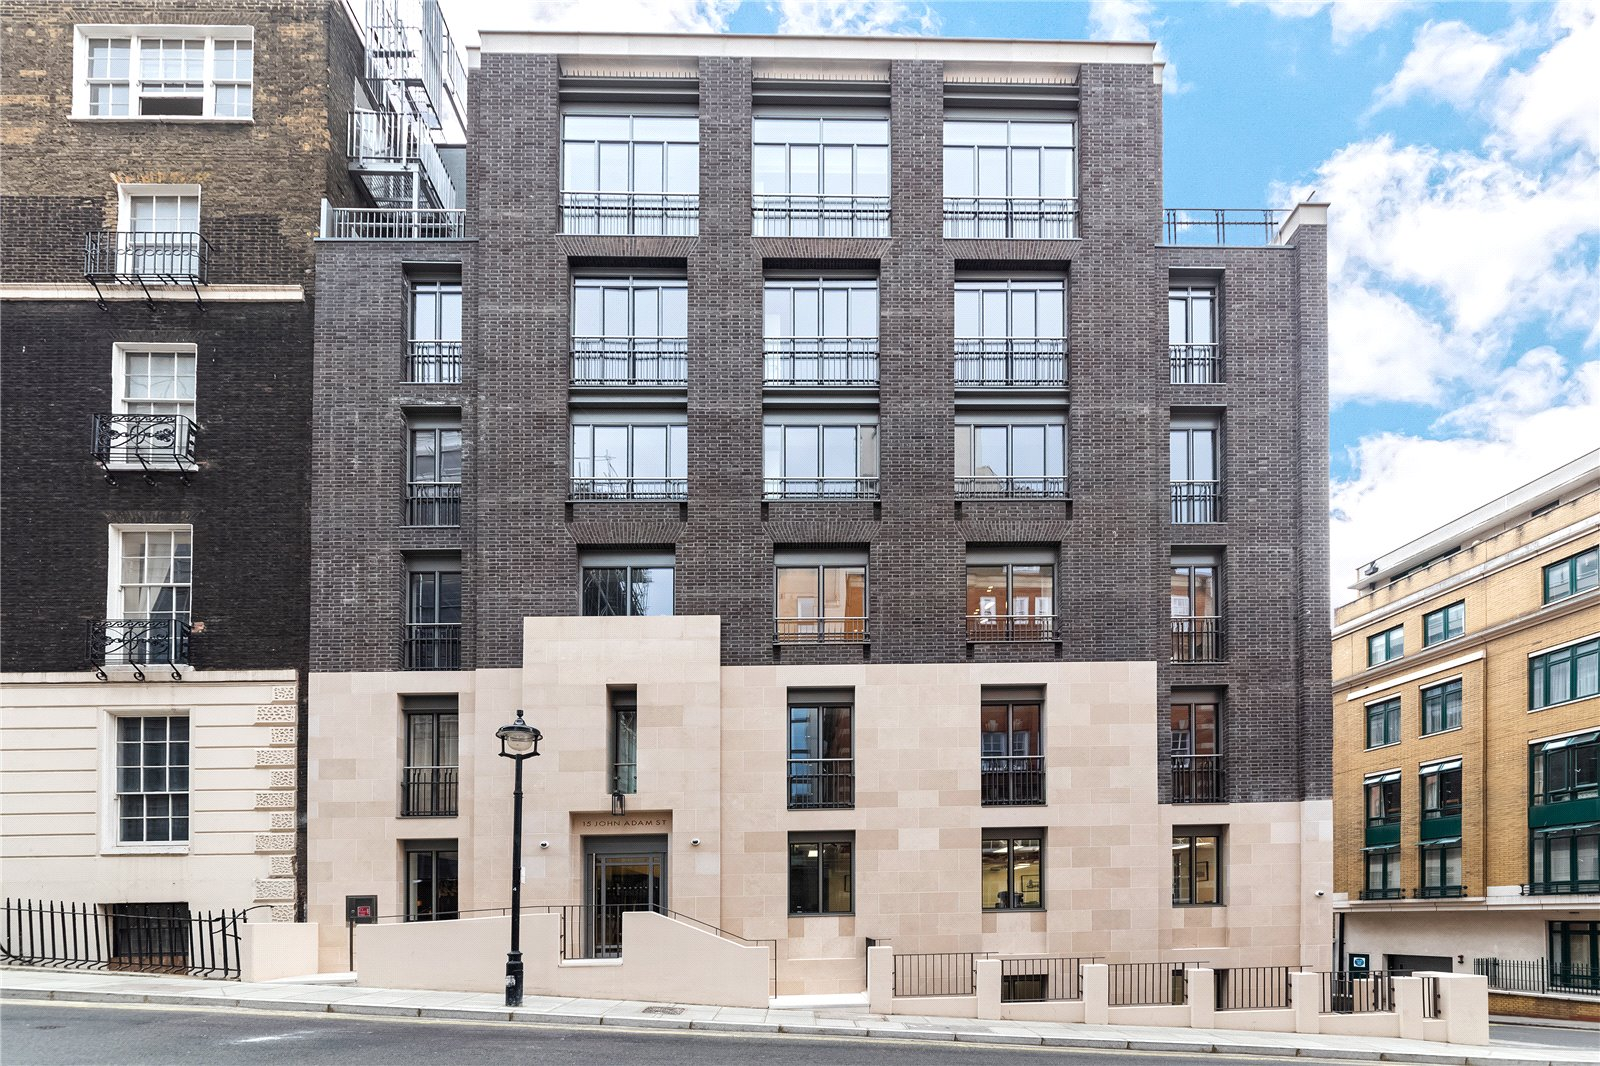 Apartment for Sale at John Adam Street, London, WC2N John Adam Street, London, WC2N